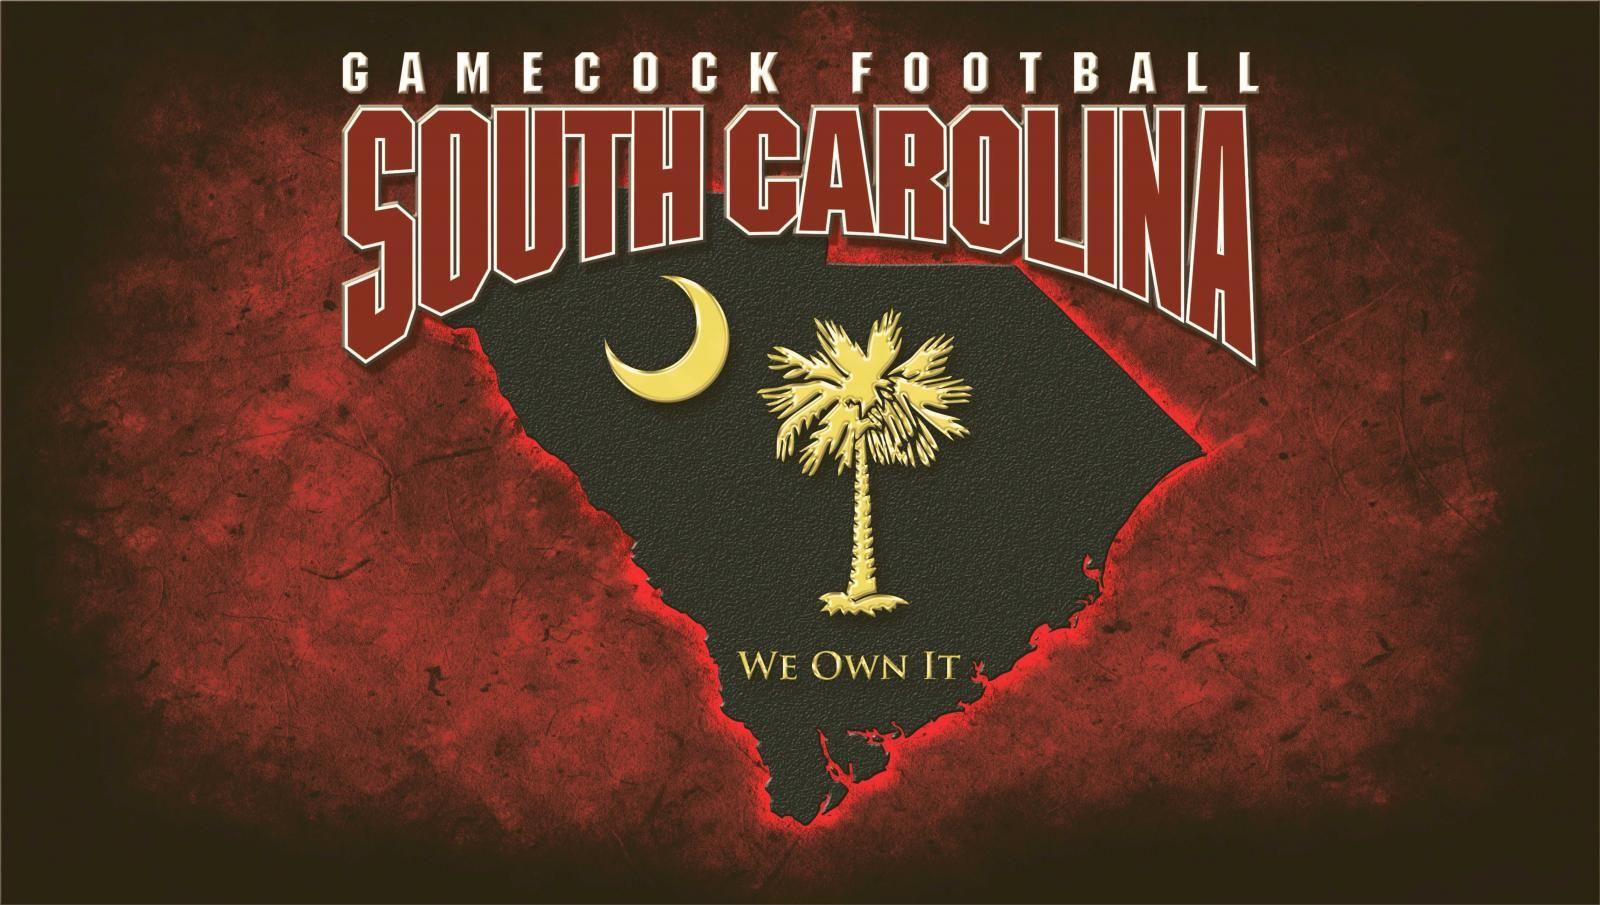 Gamecocks Wallpapers Wallpaper Gamecocks Gamecocks Football Carolina Gamecocks Football